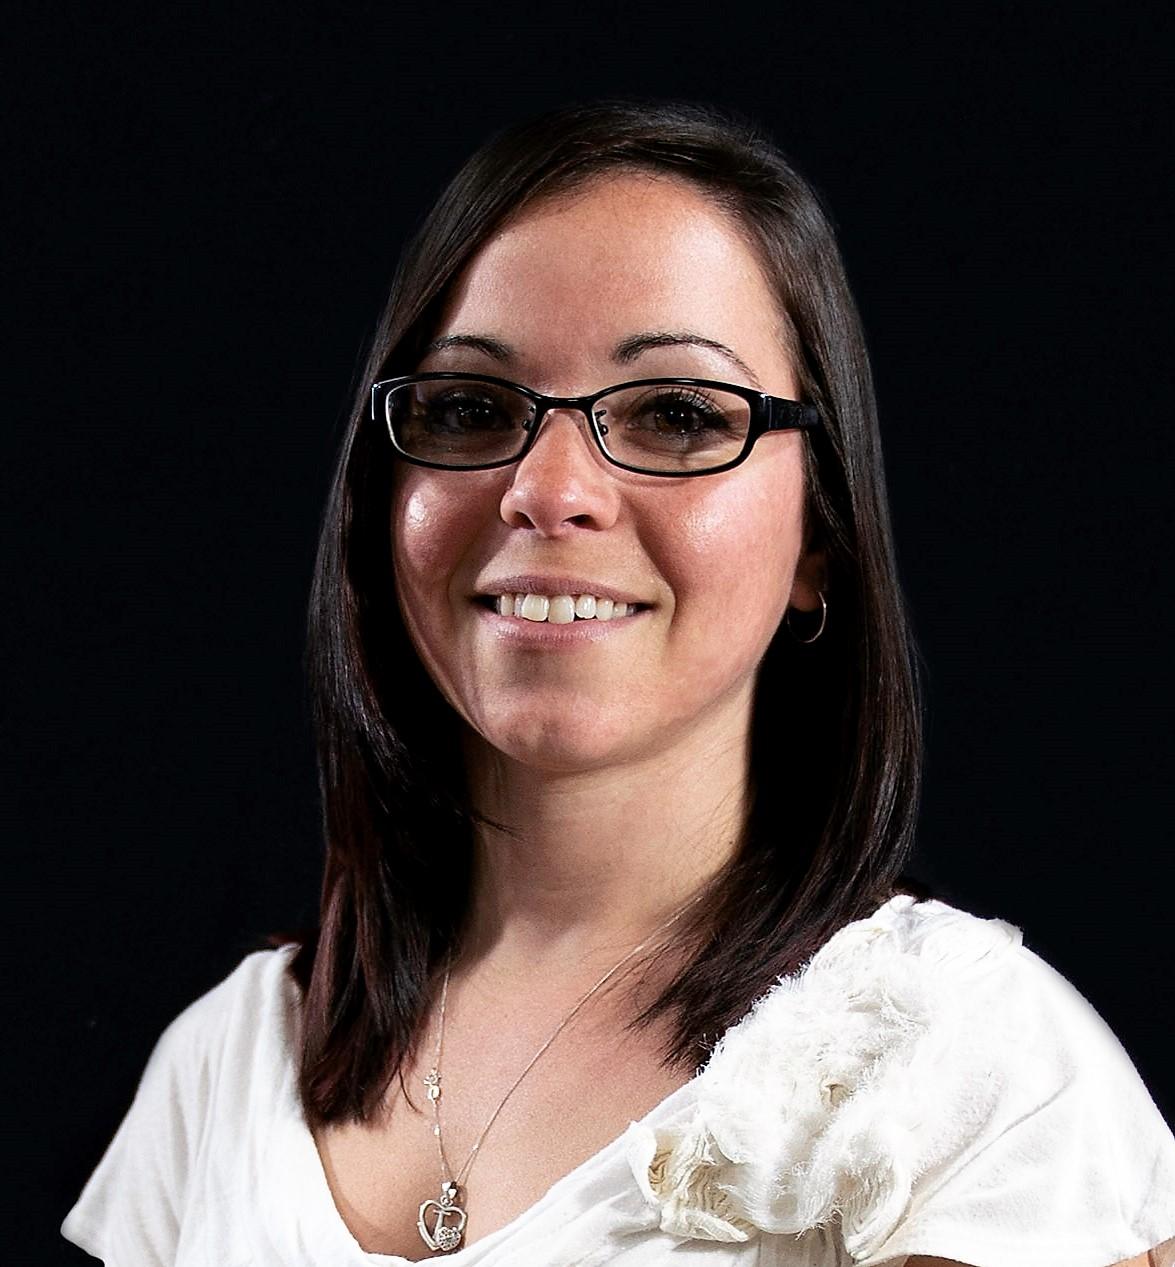 Melanie Arbon